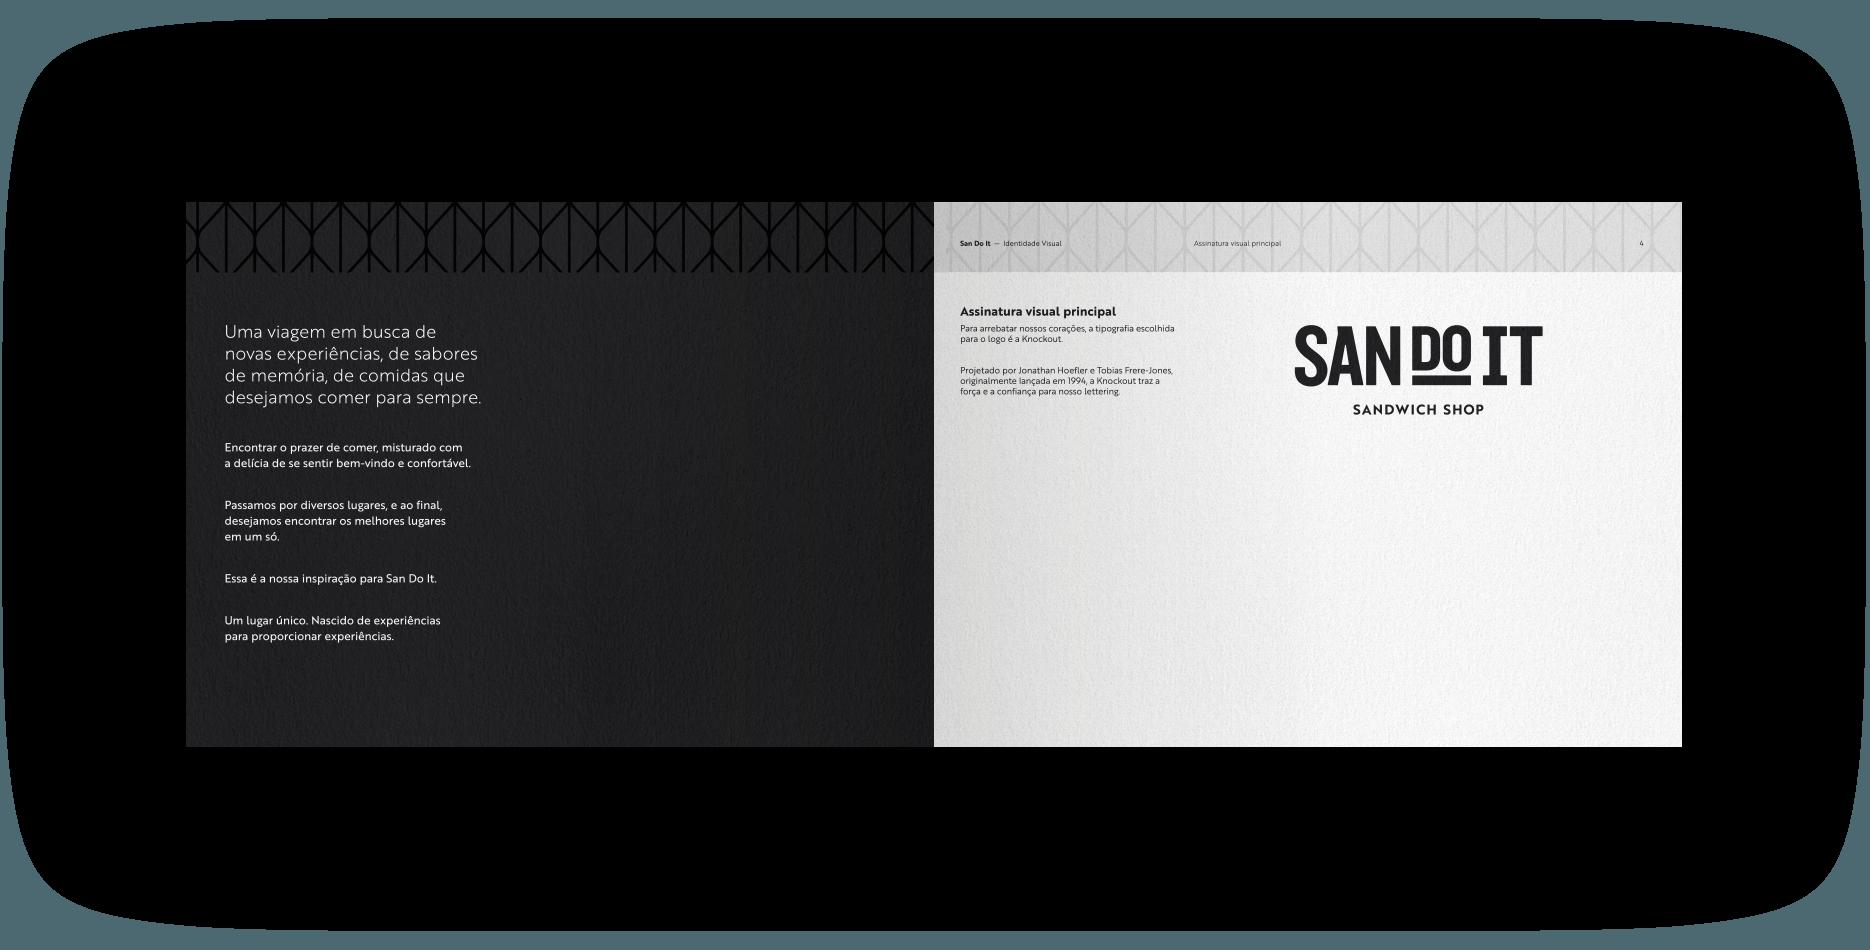 02-sandoit-strategy-brandbook